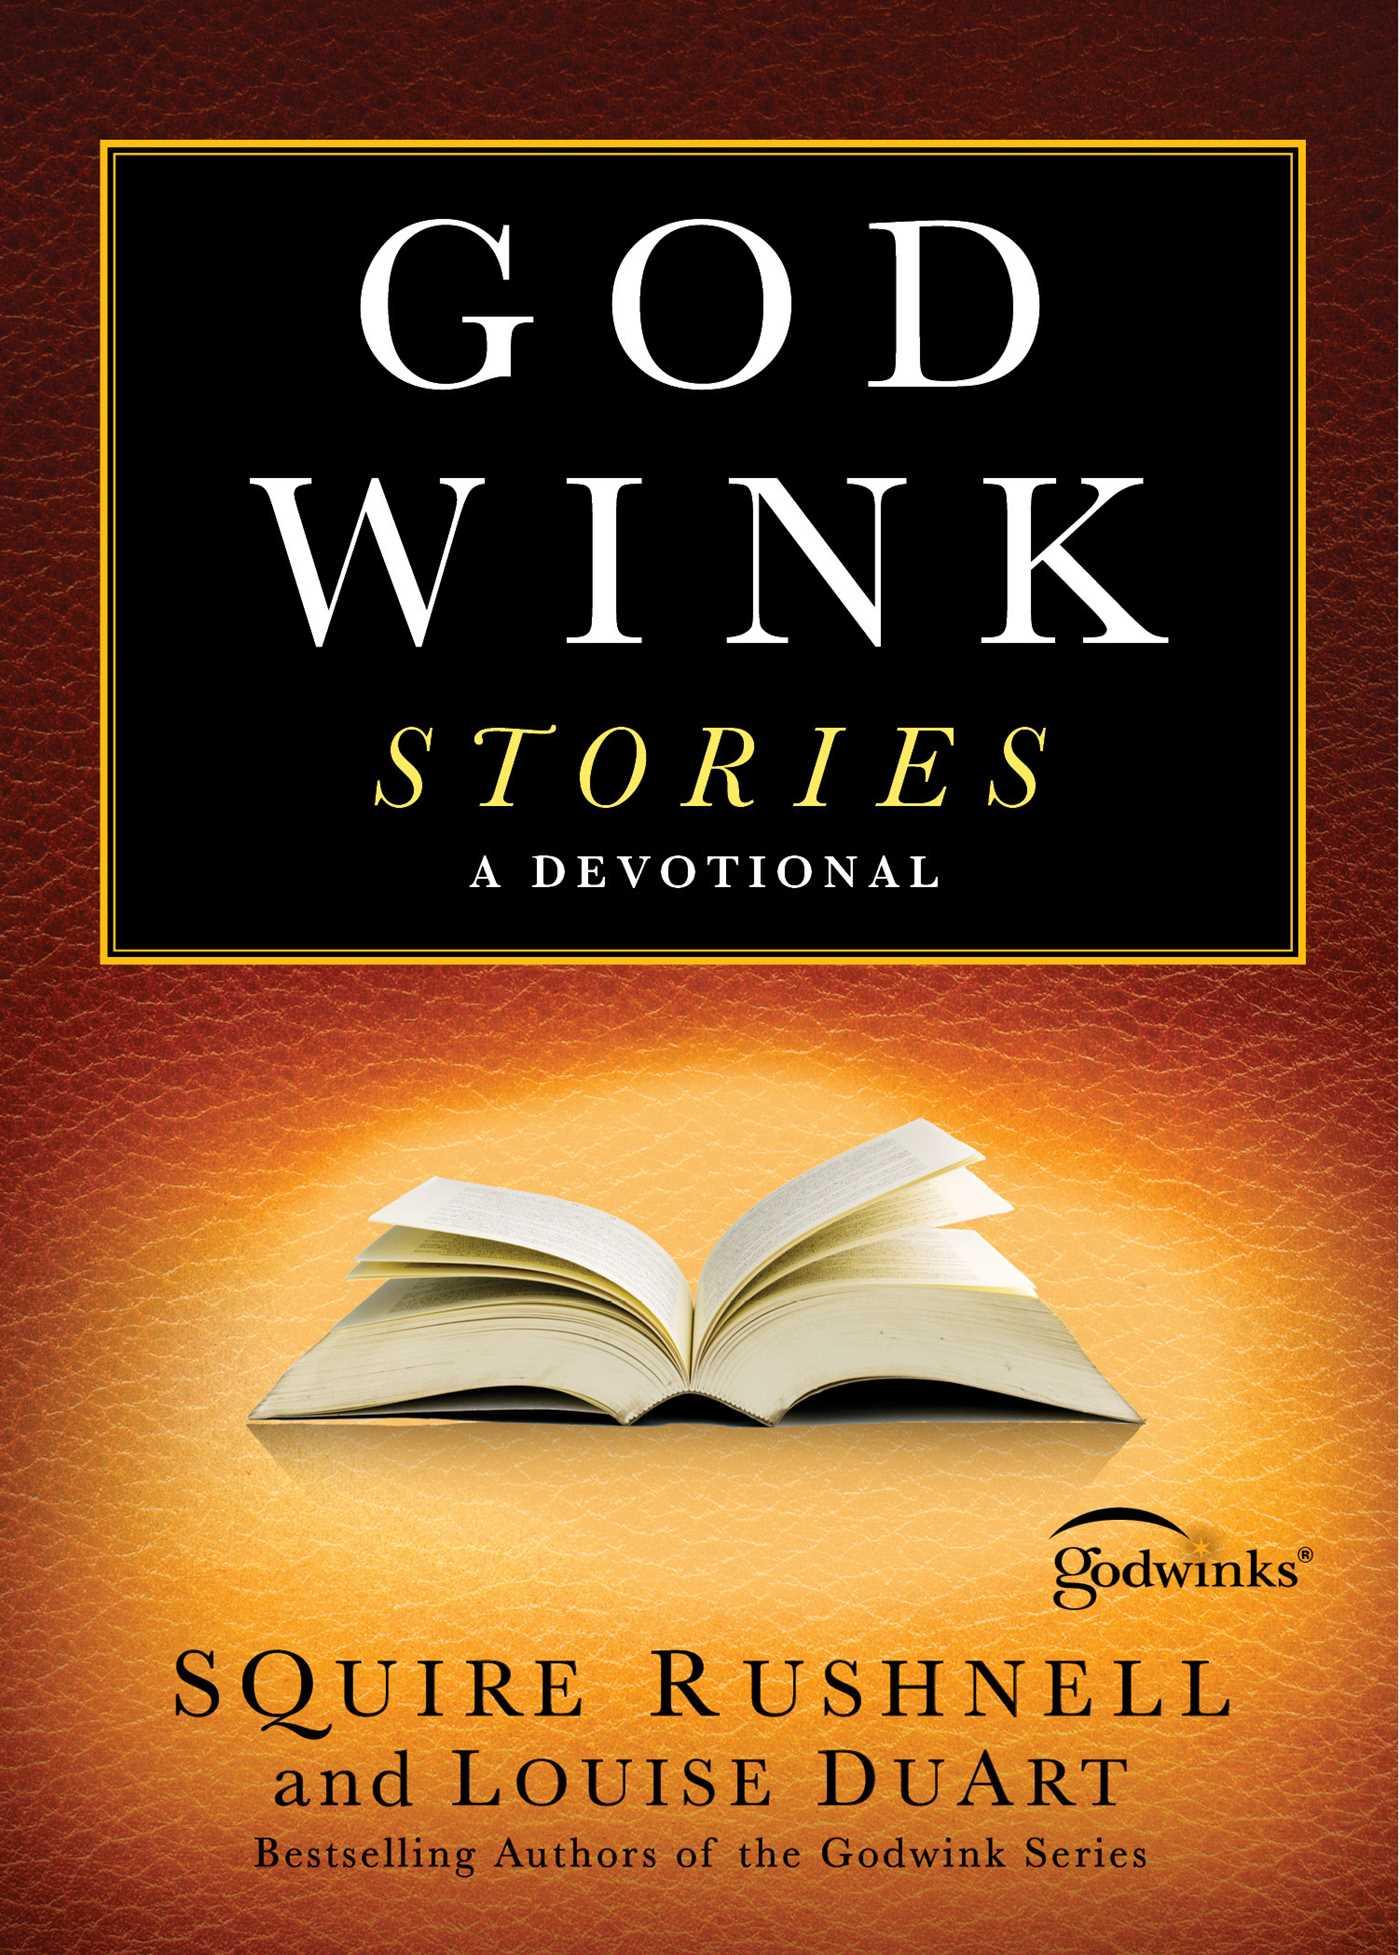 Godwink